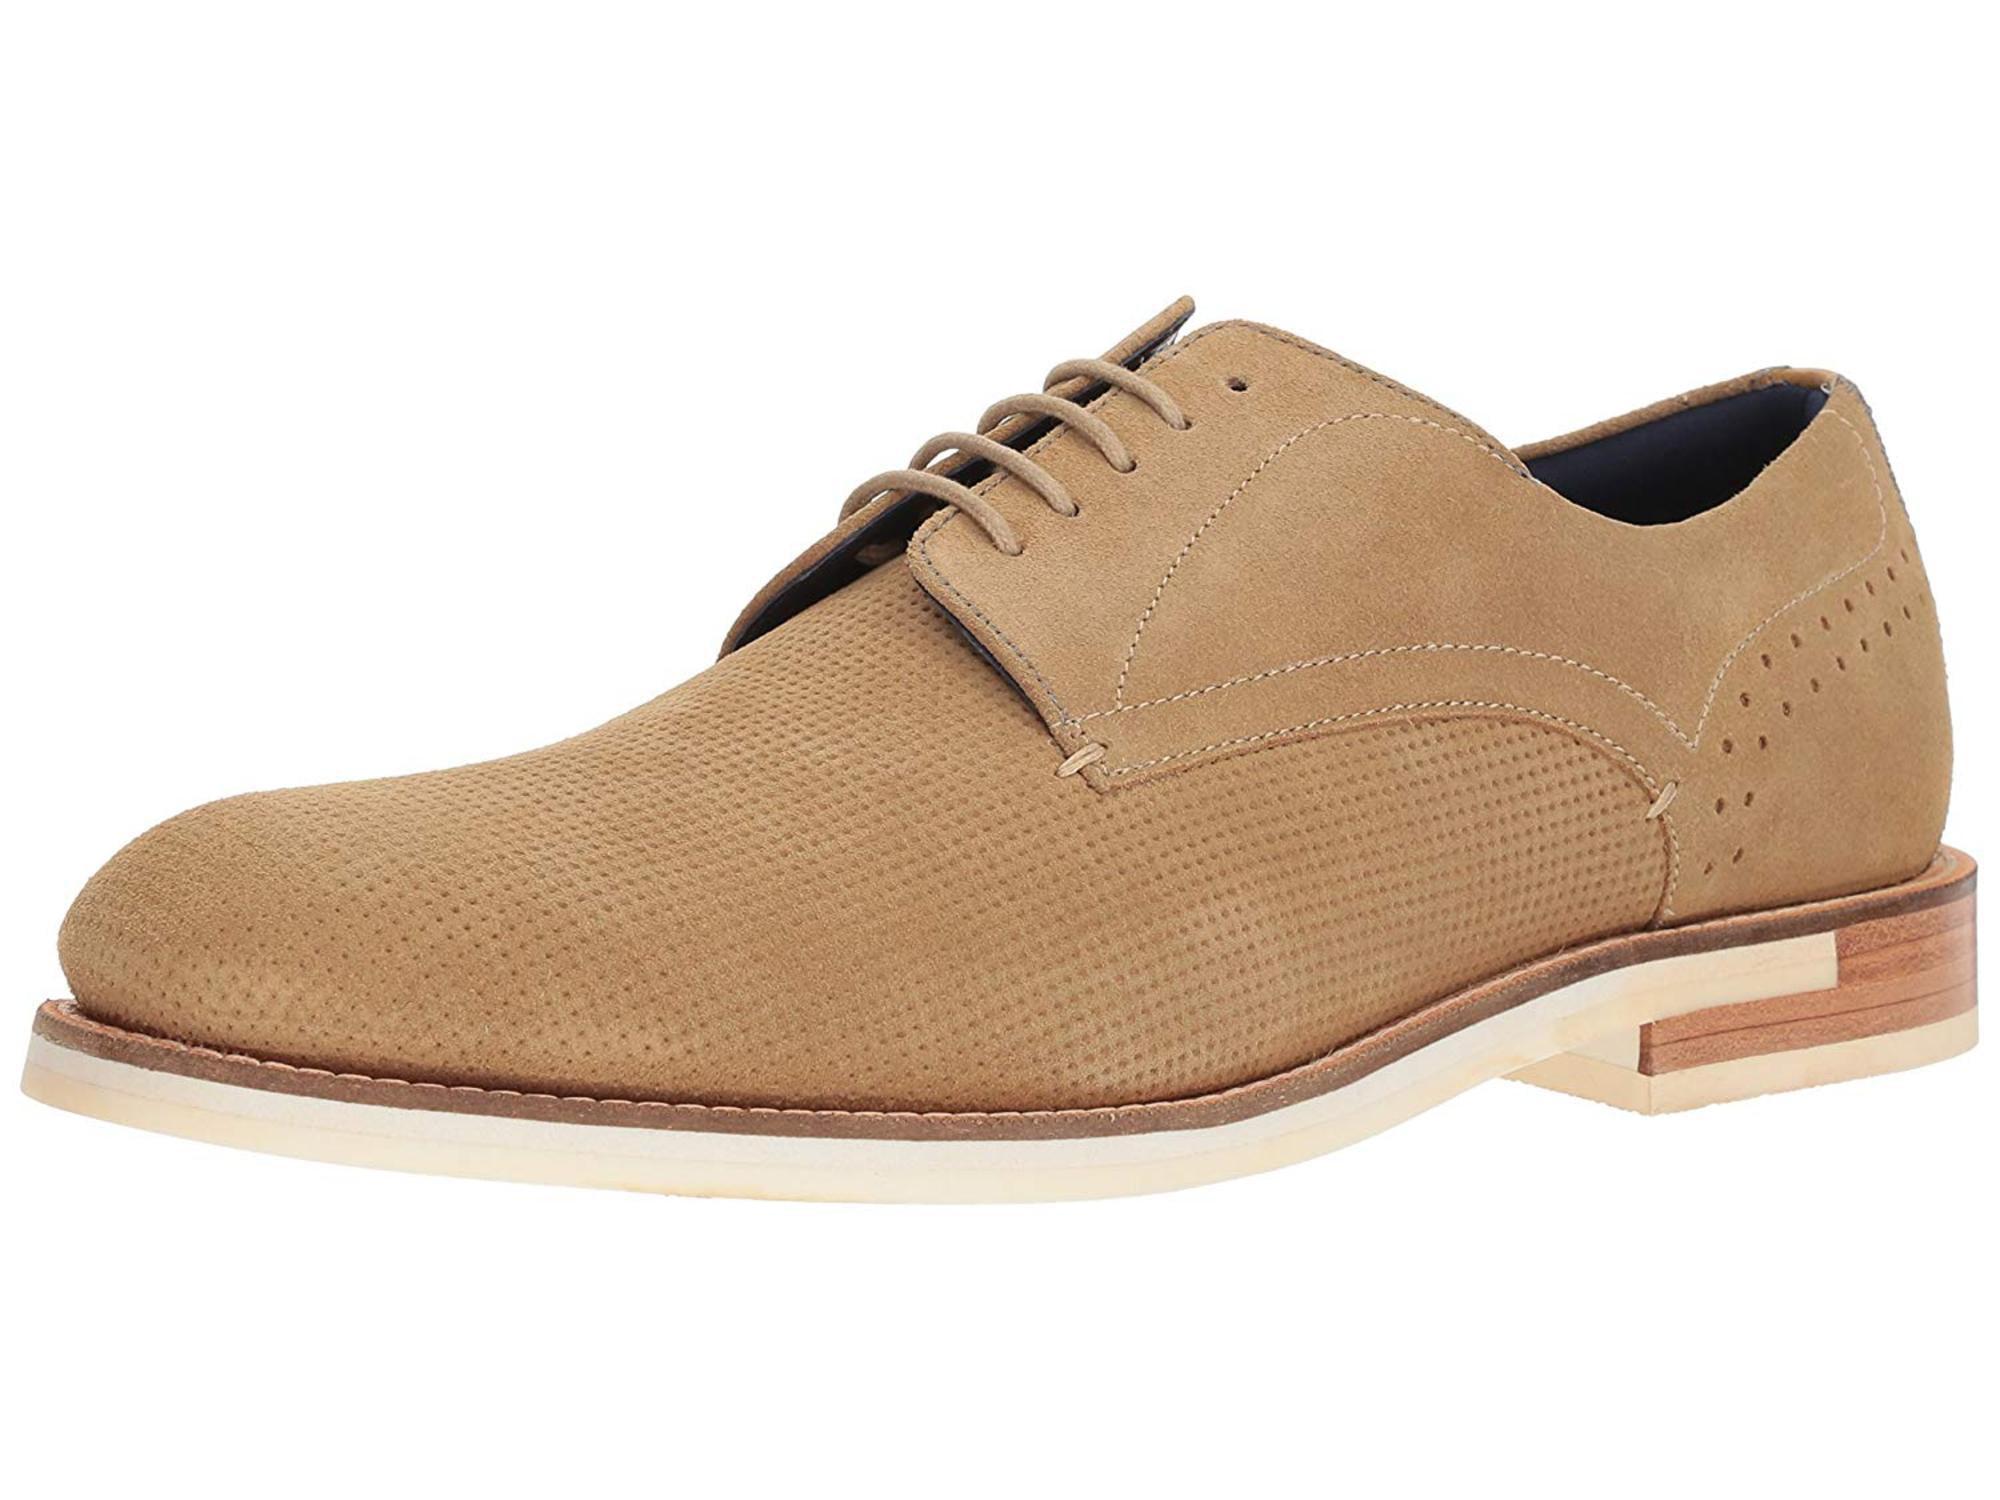 Details about  /Ted Baker Men/'s Lapiin Oxford Choose SZ//color